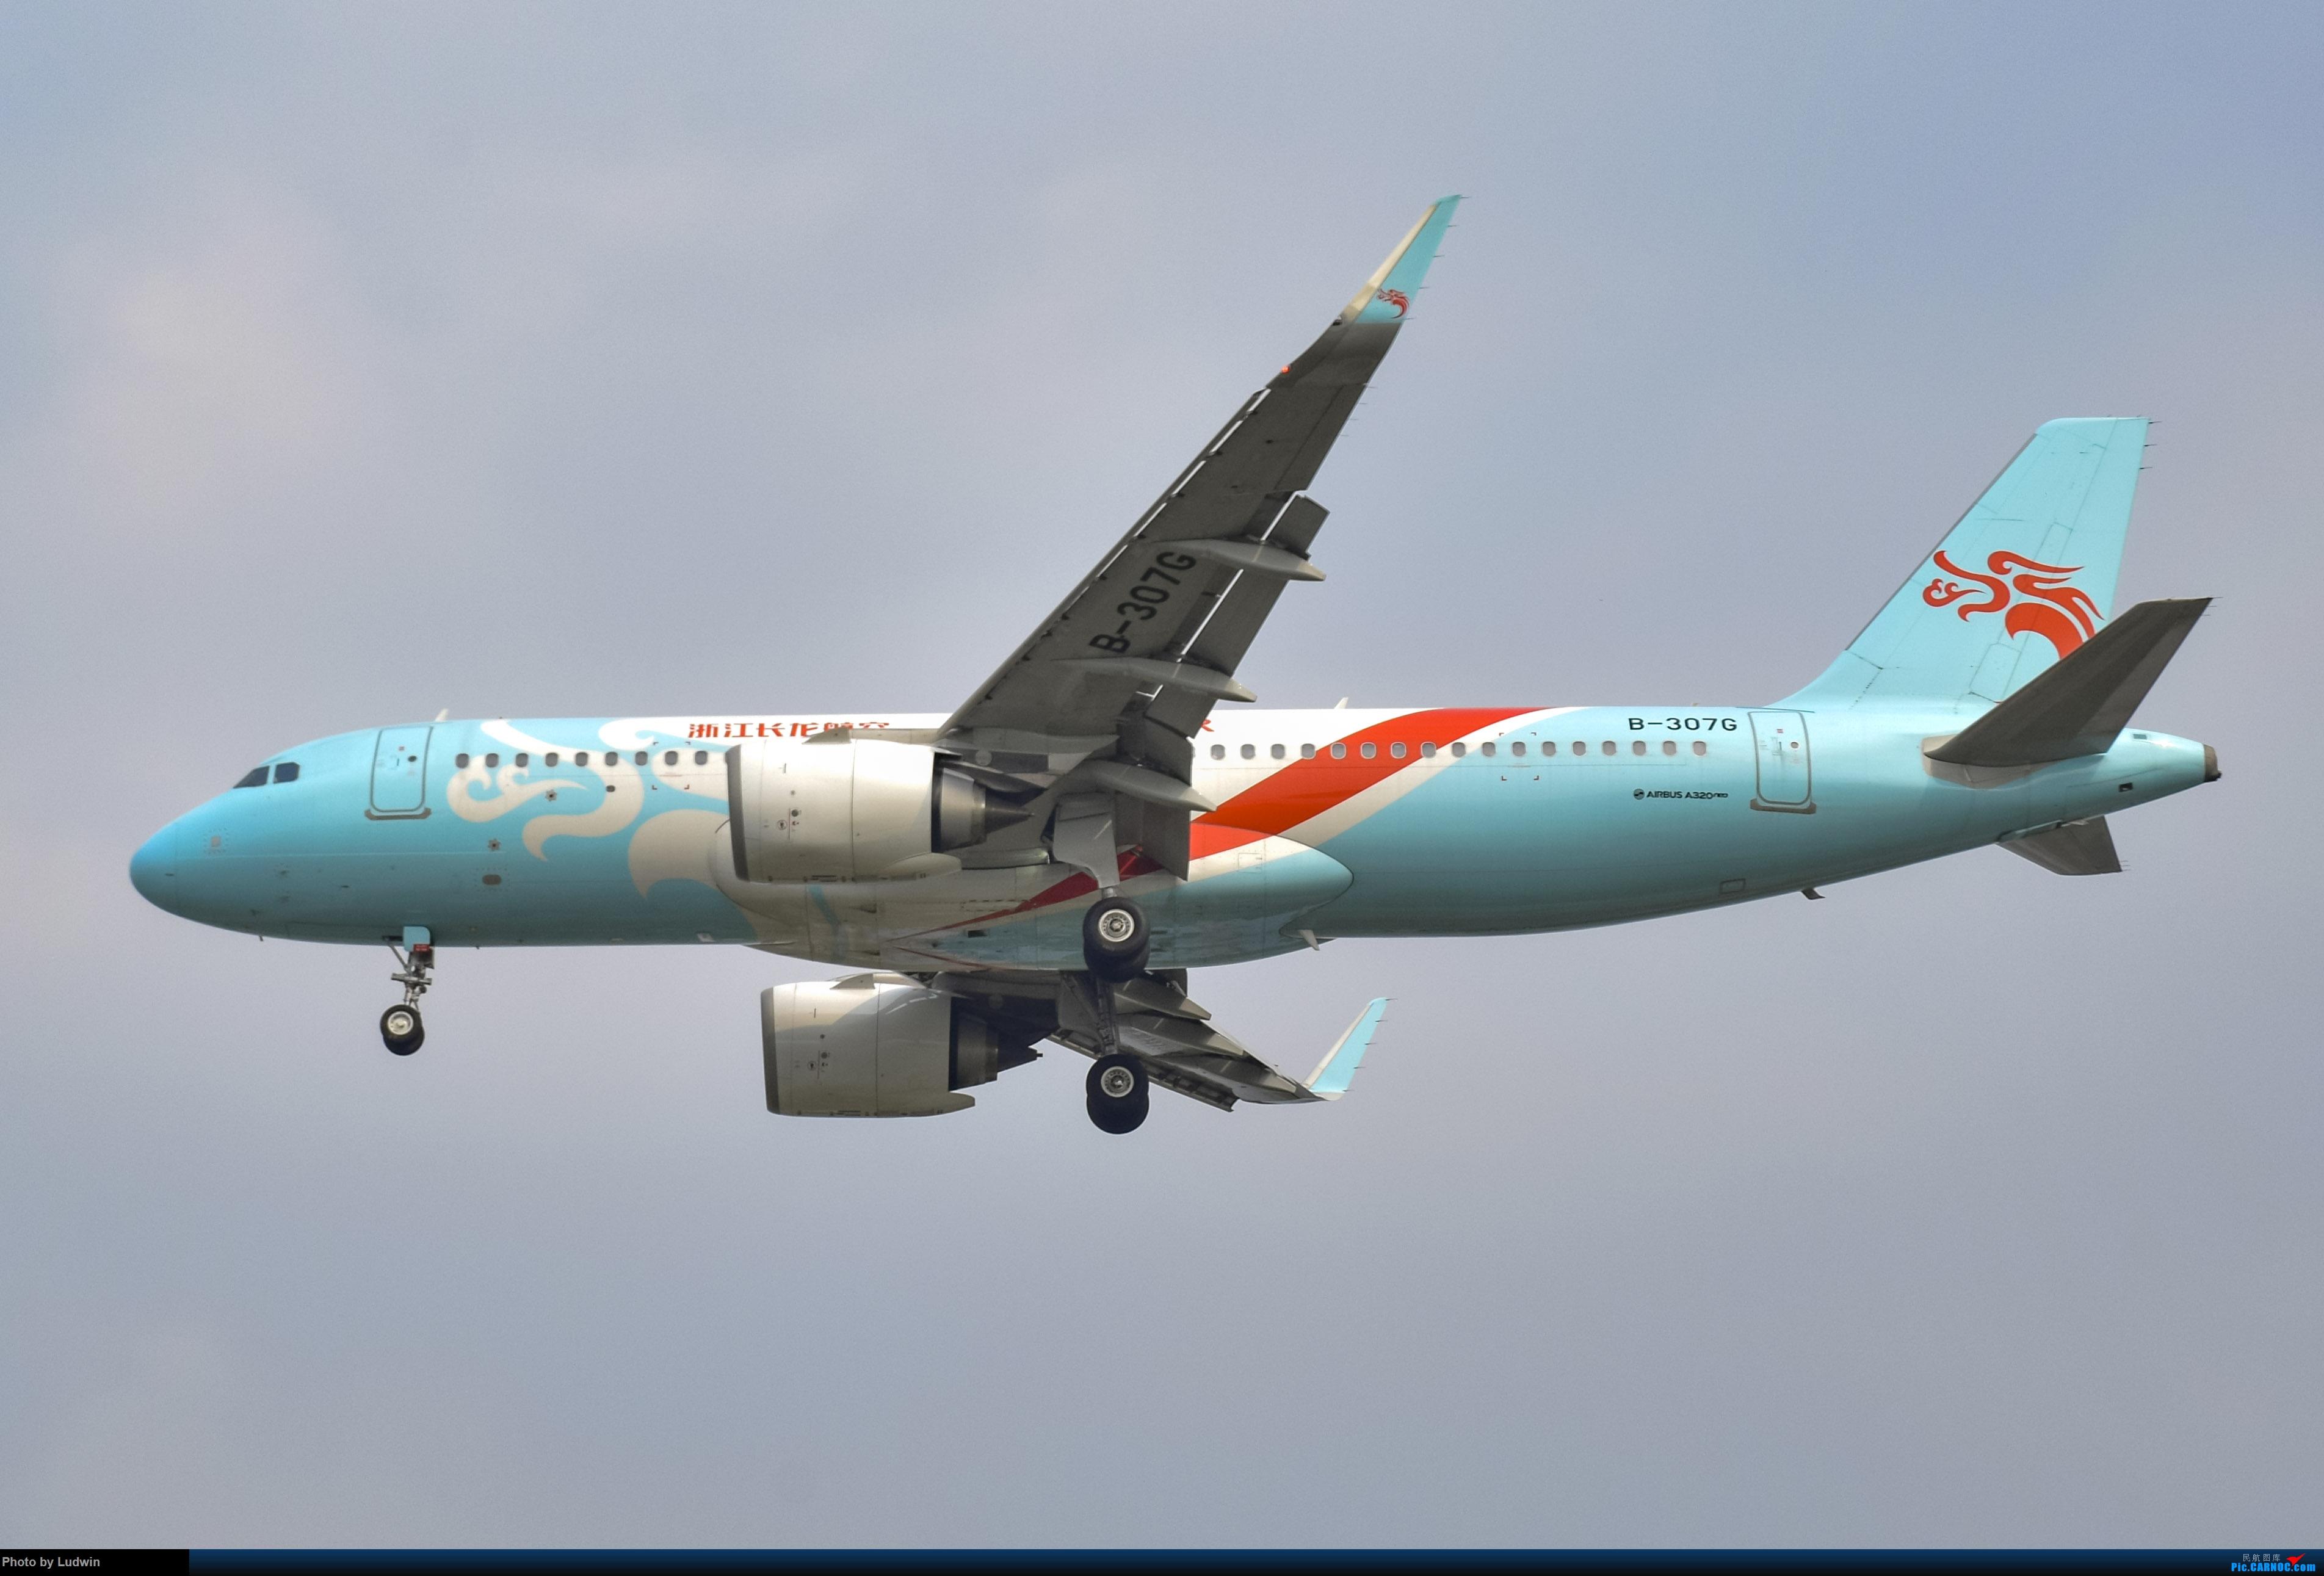 Re:[原创]没有地景系列 AIRBUS A320NEO B-307G 中国重庆江北国际机场